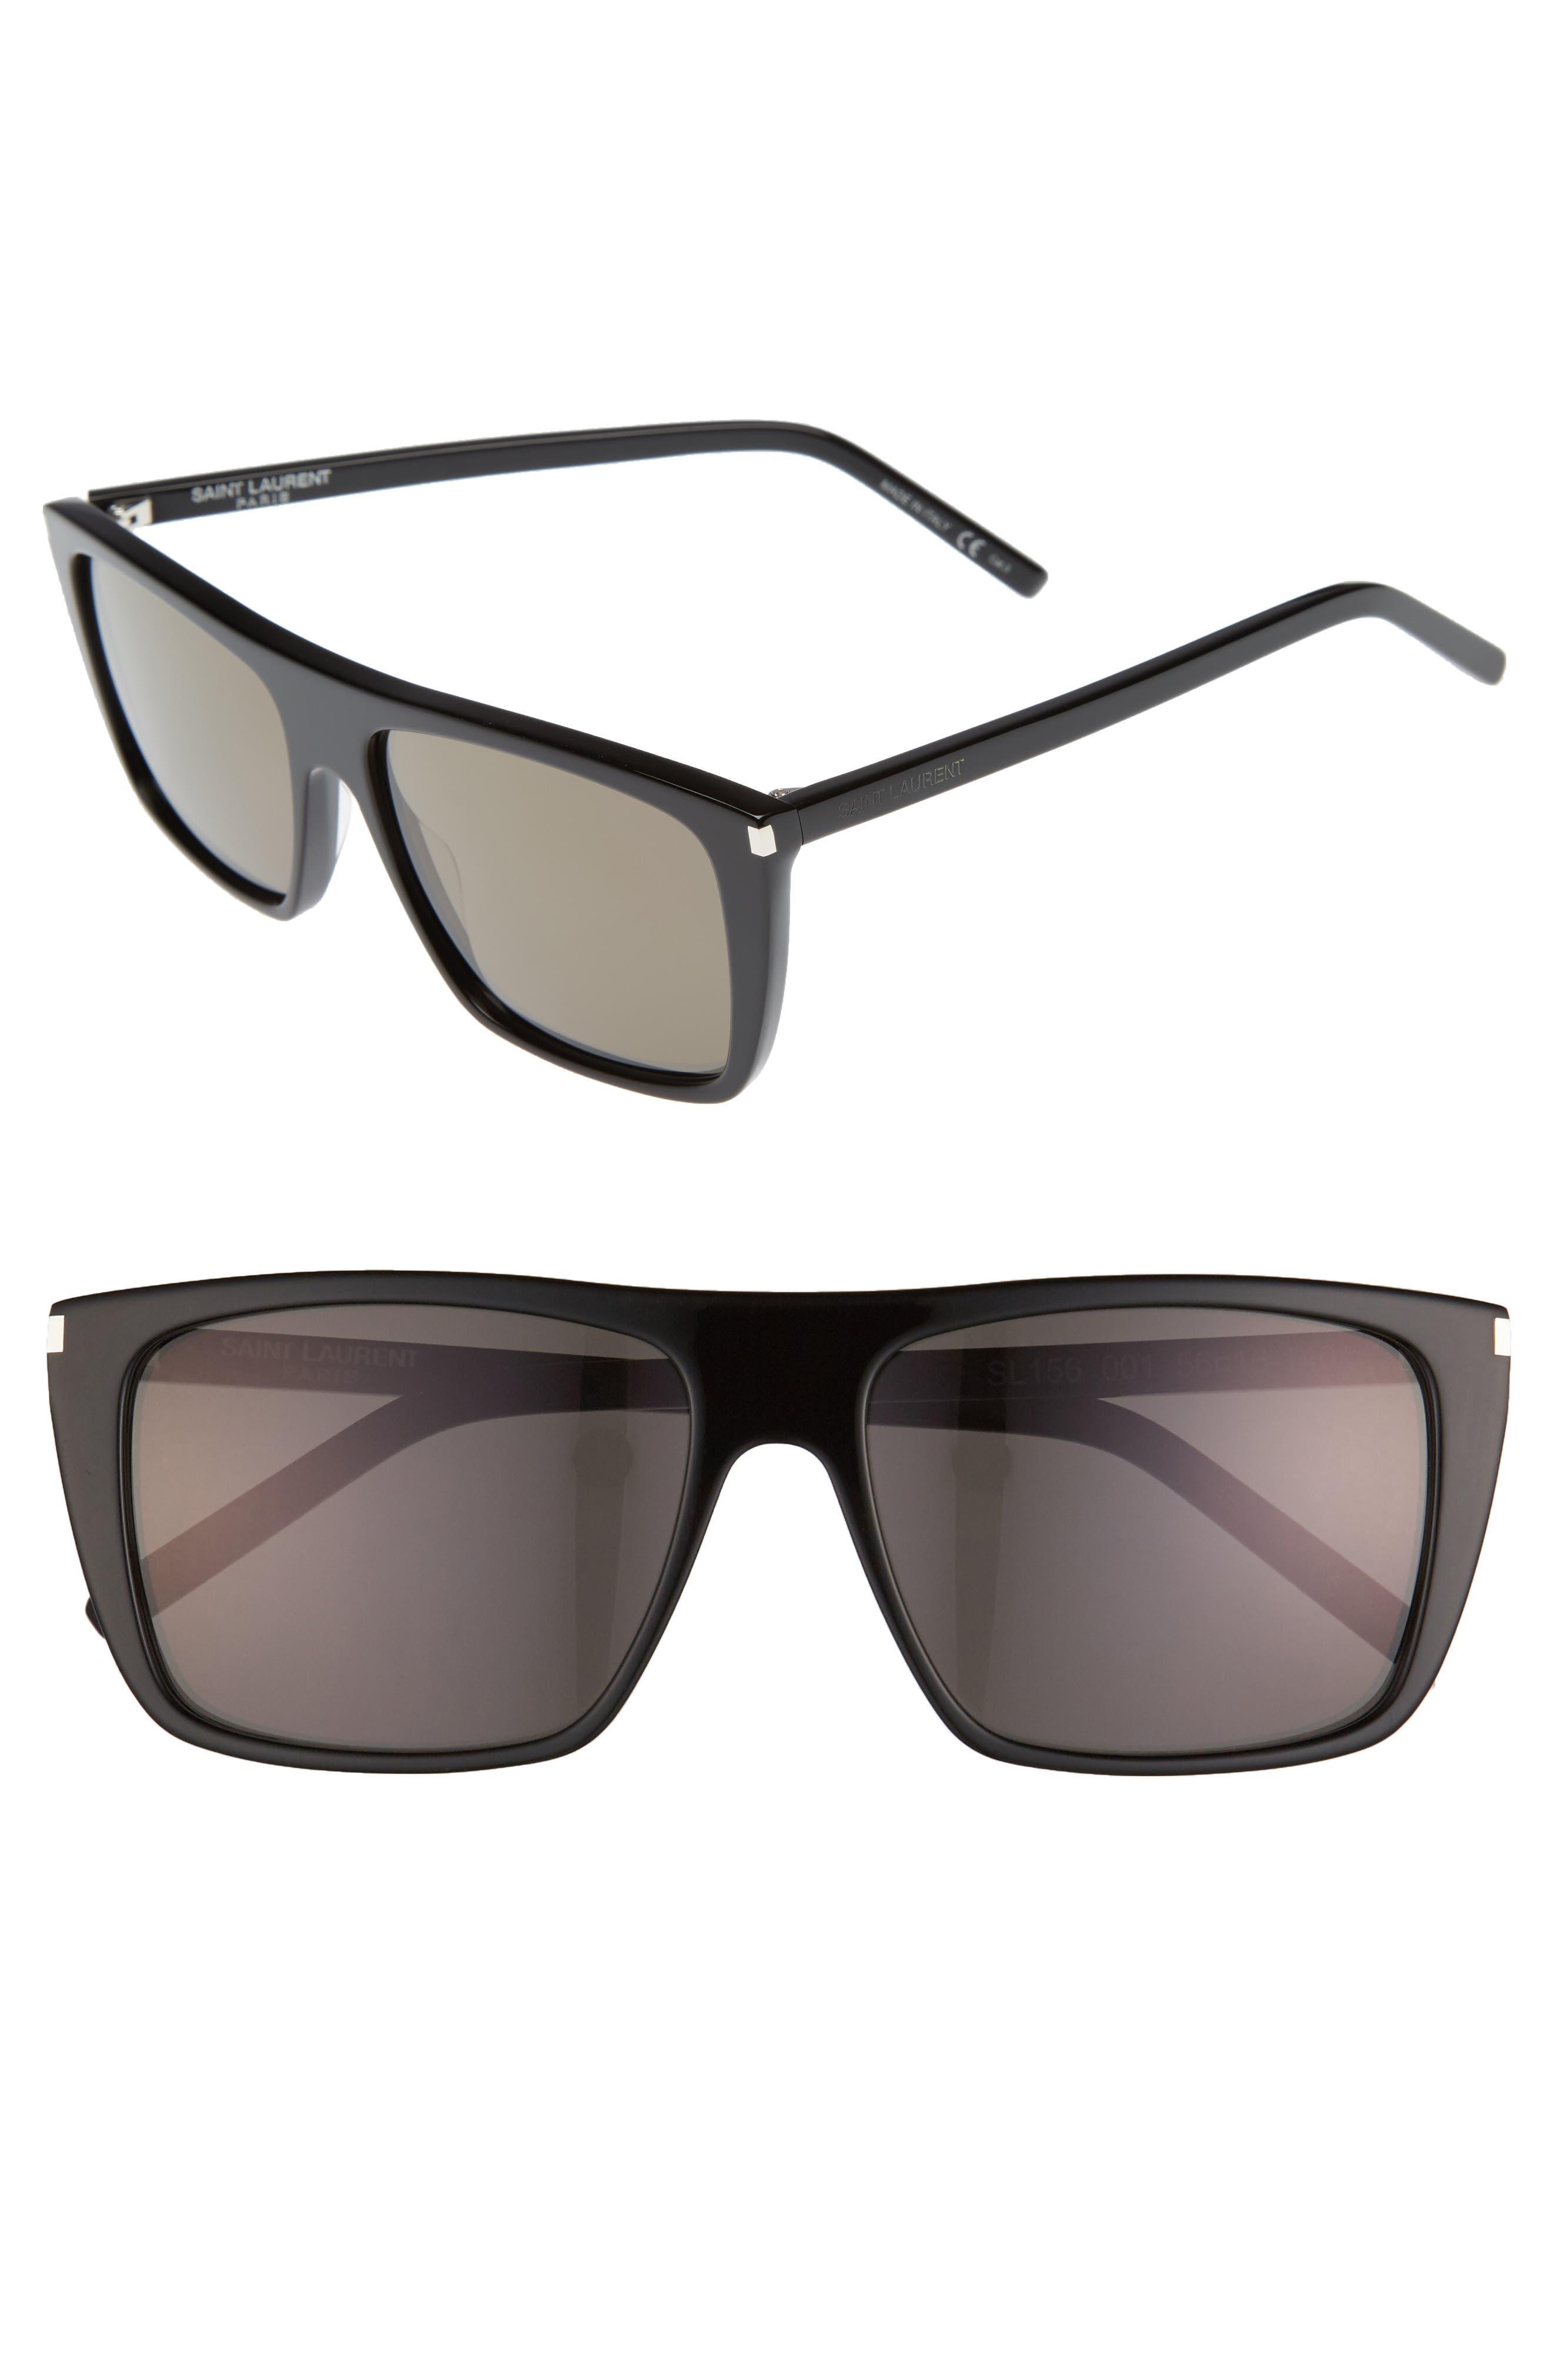 SAINT LAURENT, Avana 56mm Flat Top Sunglasses, Main thumbnail 1, color, 001